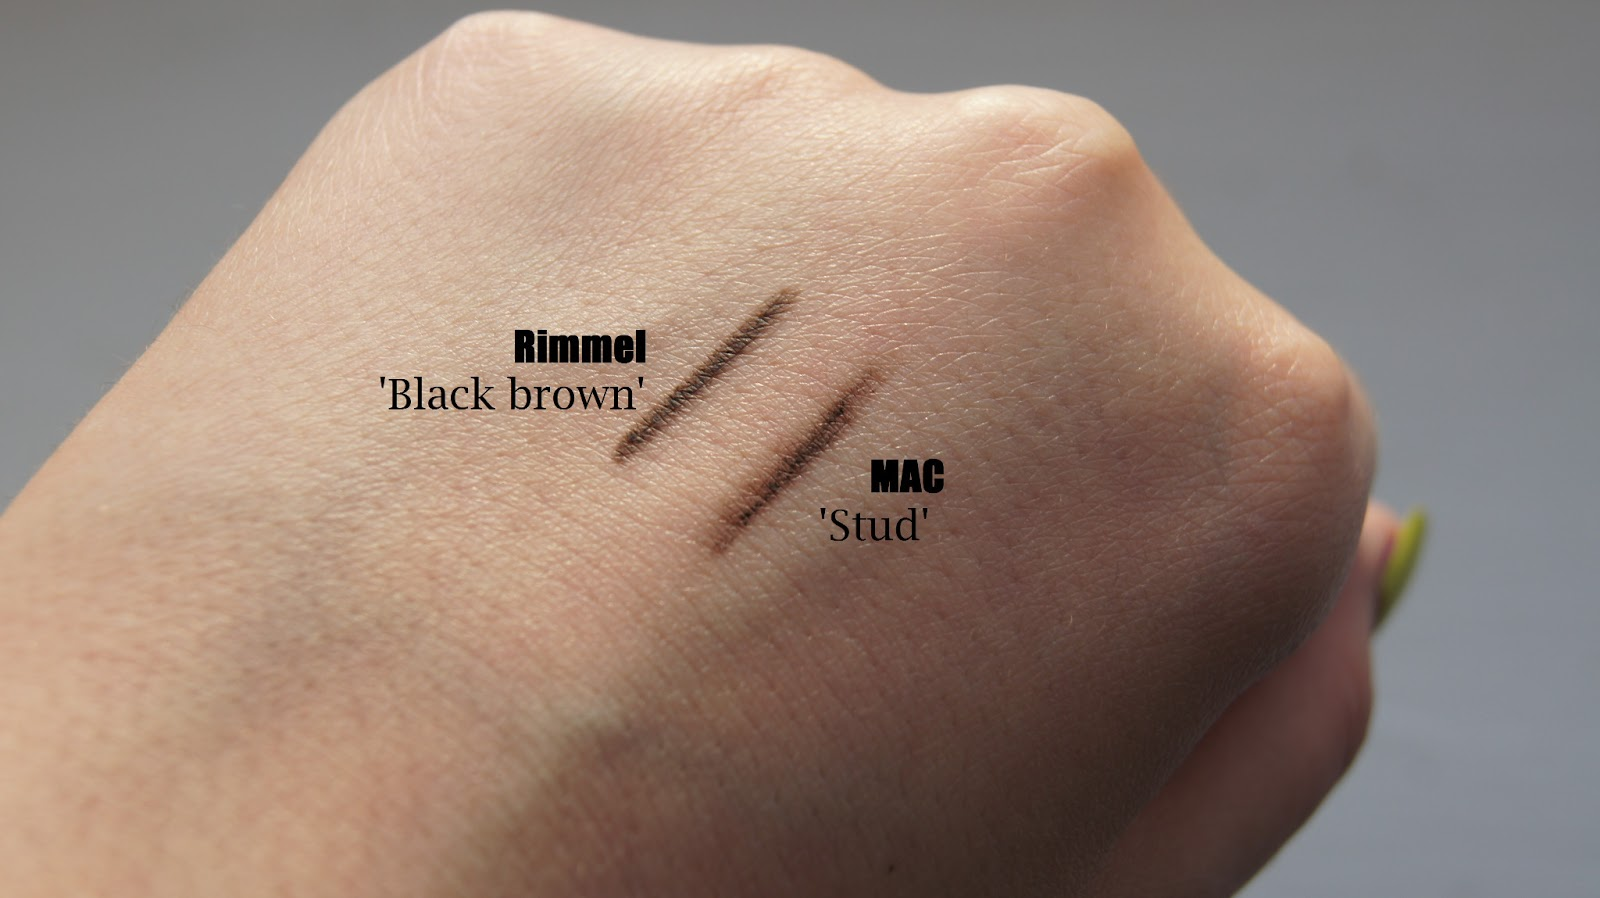 Mac Stud Eye Brows Pencil Review Swatch 5363357 Angrybirdsriogamefo